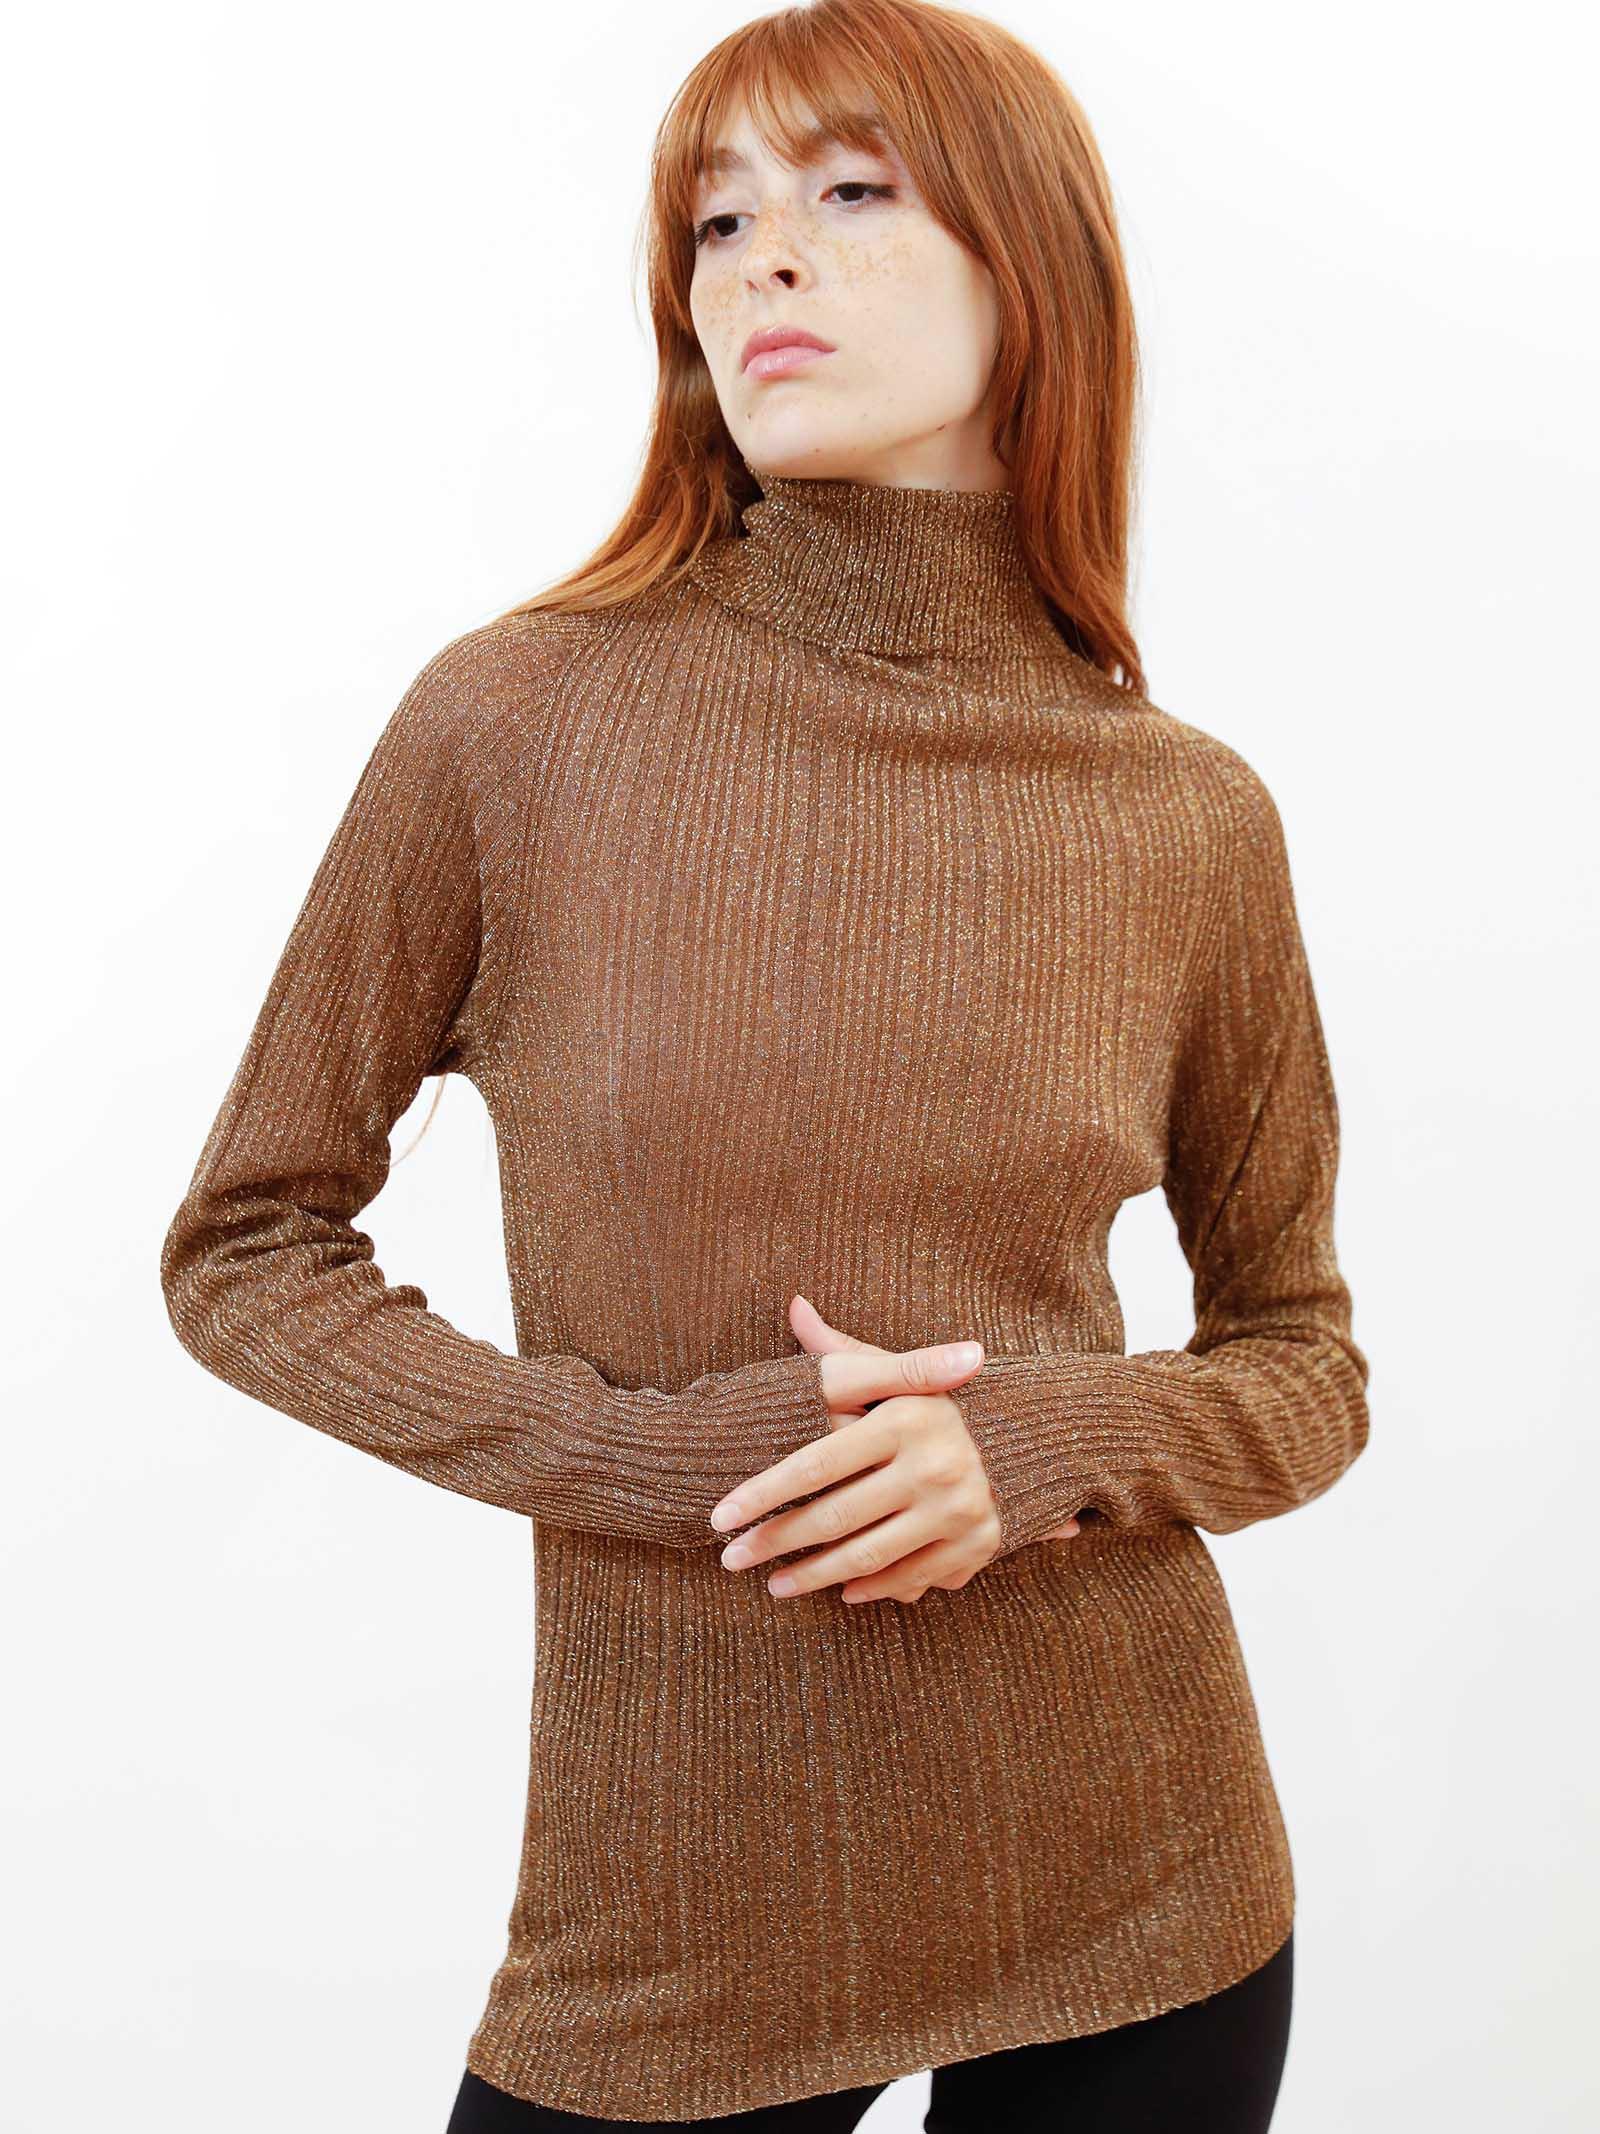 Women's Clothing Ribbed Turtleneck Sweater in Caramel Lurex Maliparmi | Knitwear | JQ48867036541008